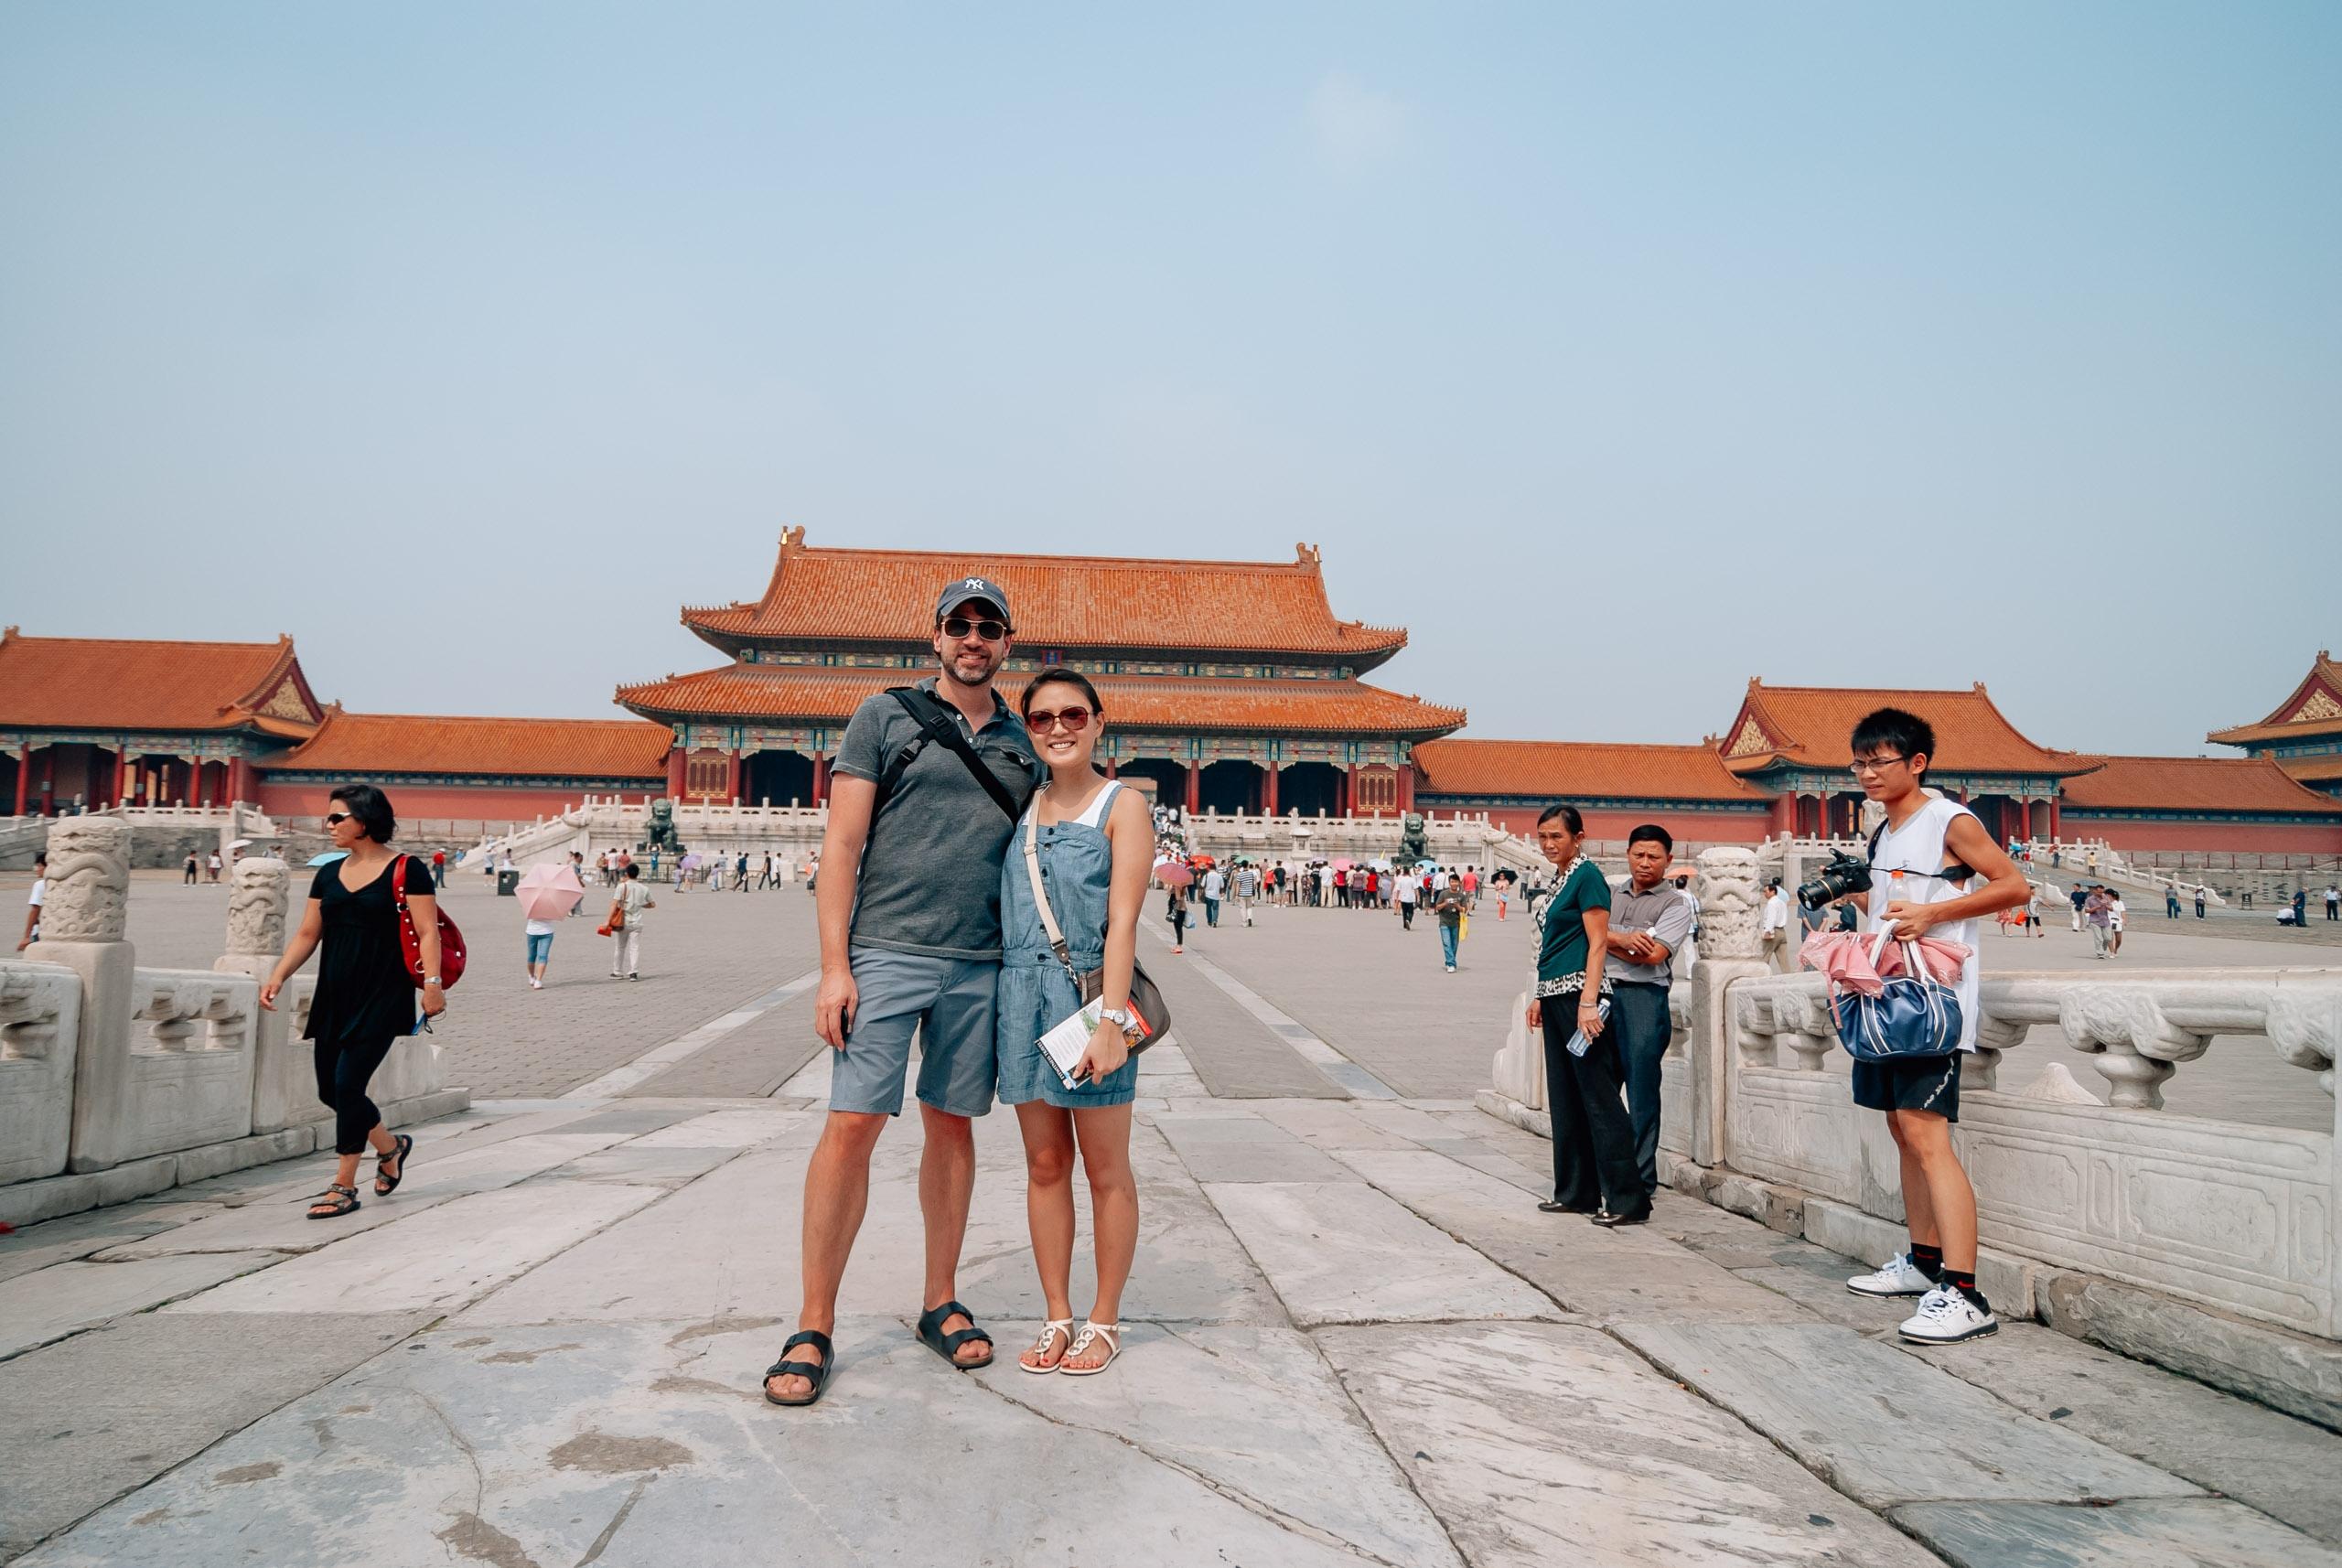 China - Beijing & The Great Wall - 2010-0903-DSC_0327_102211